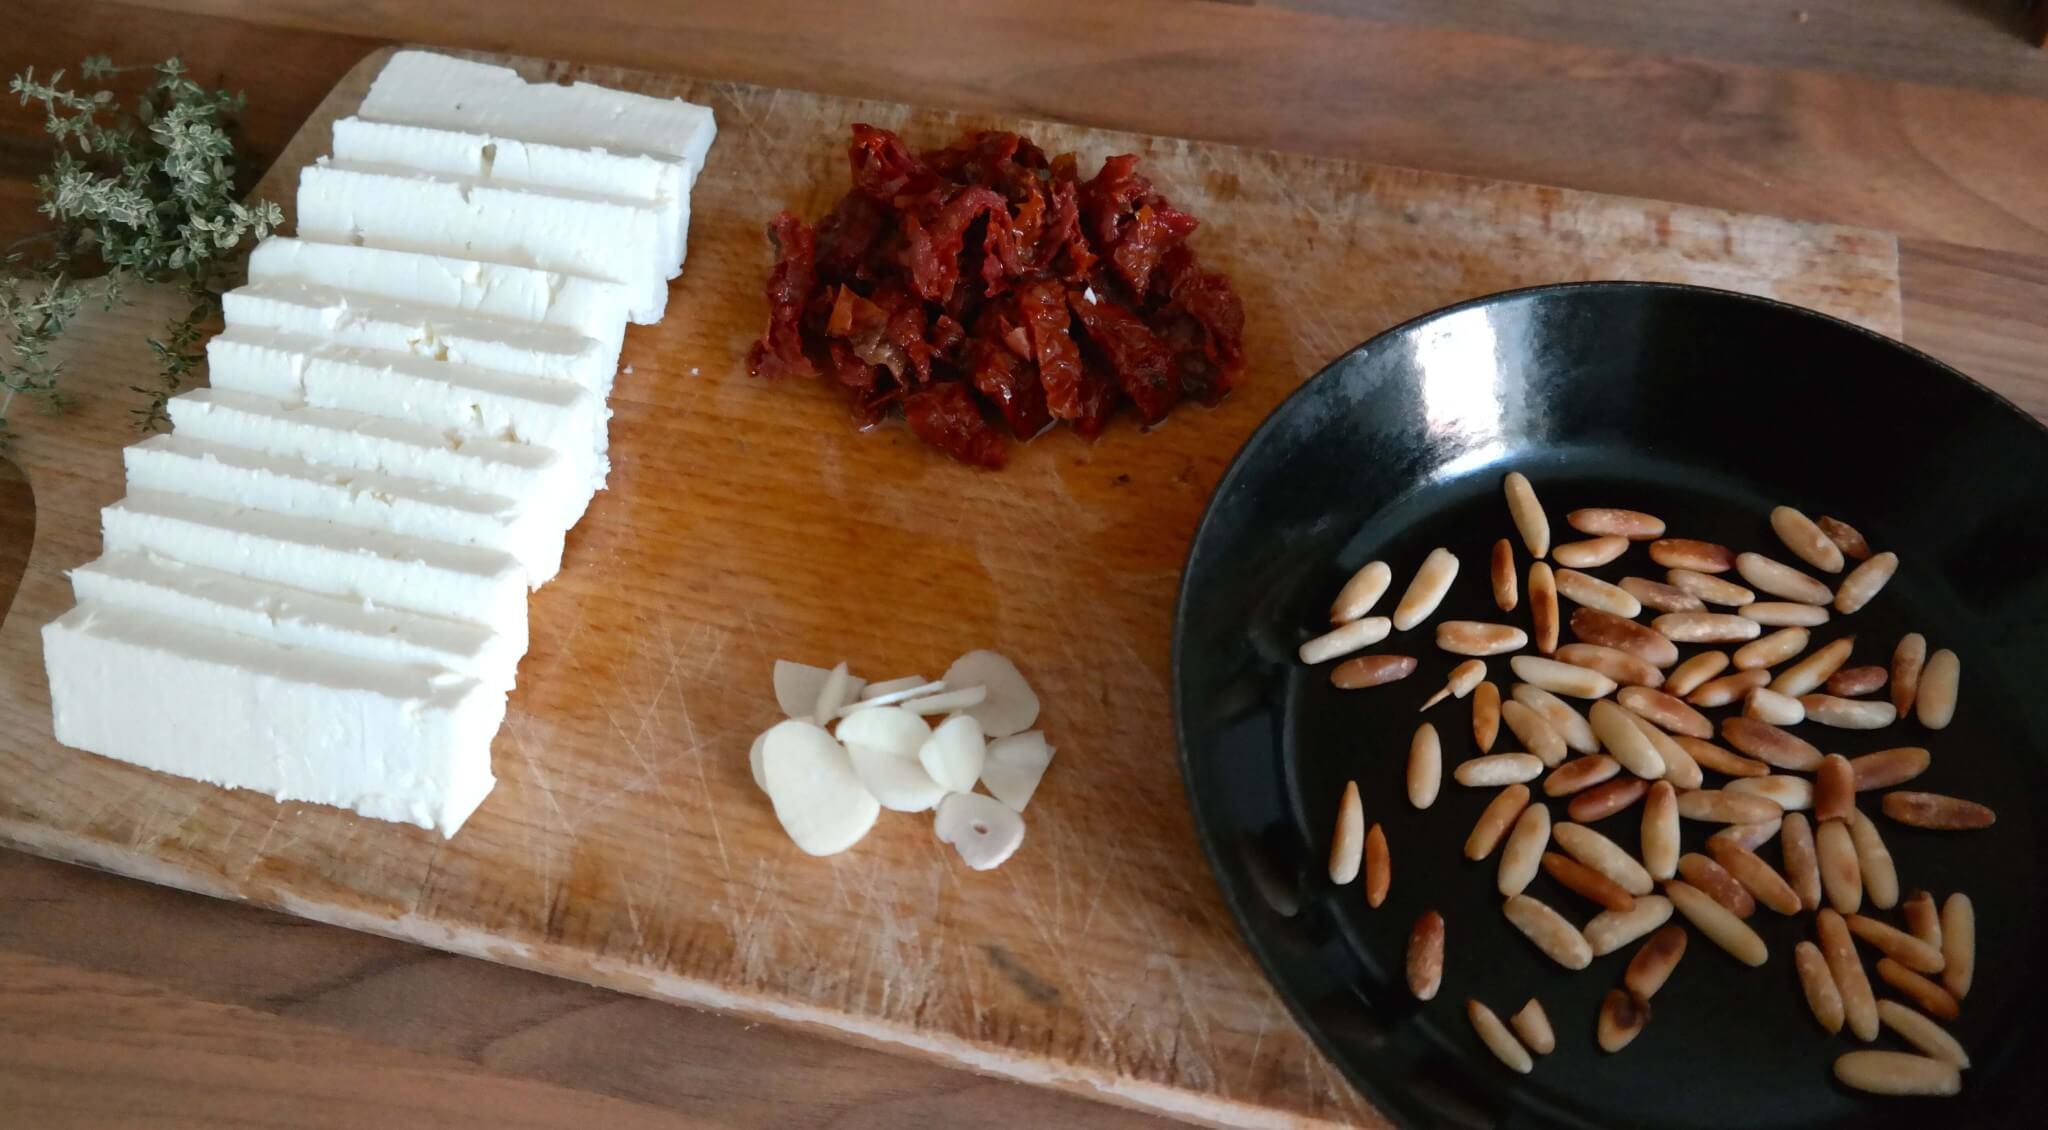 Fetapäckchen Vorbereitung - Lifestyle Blog